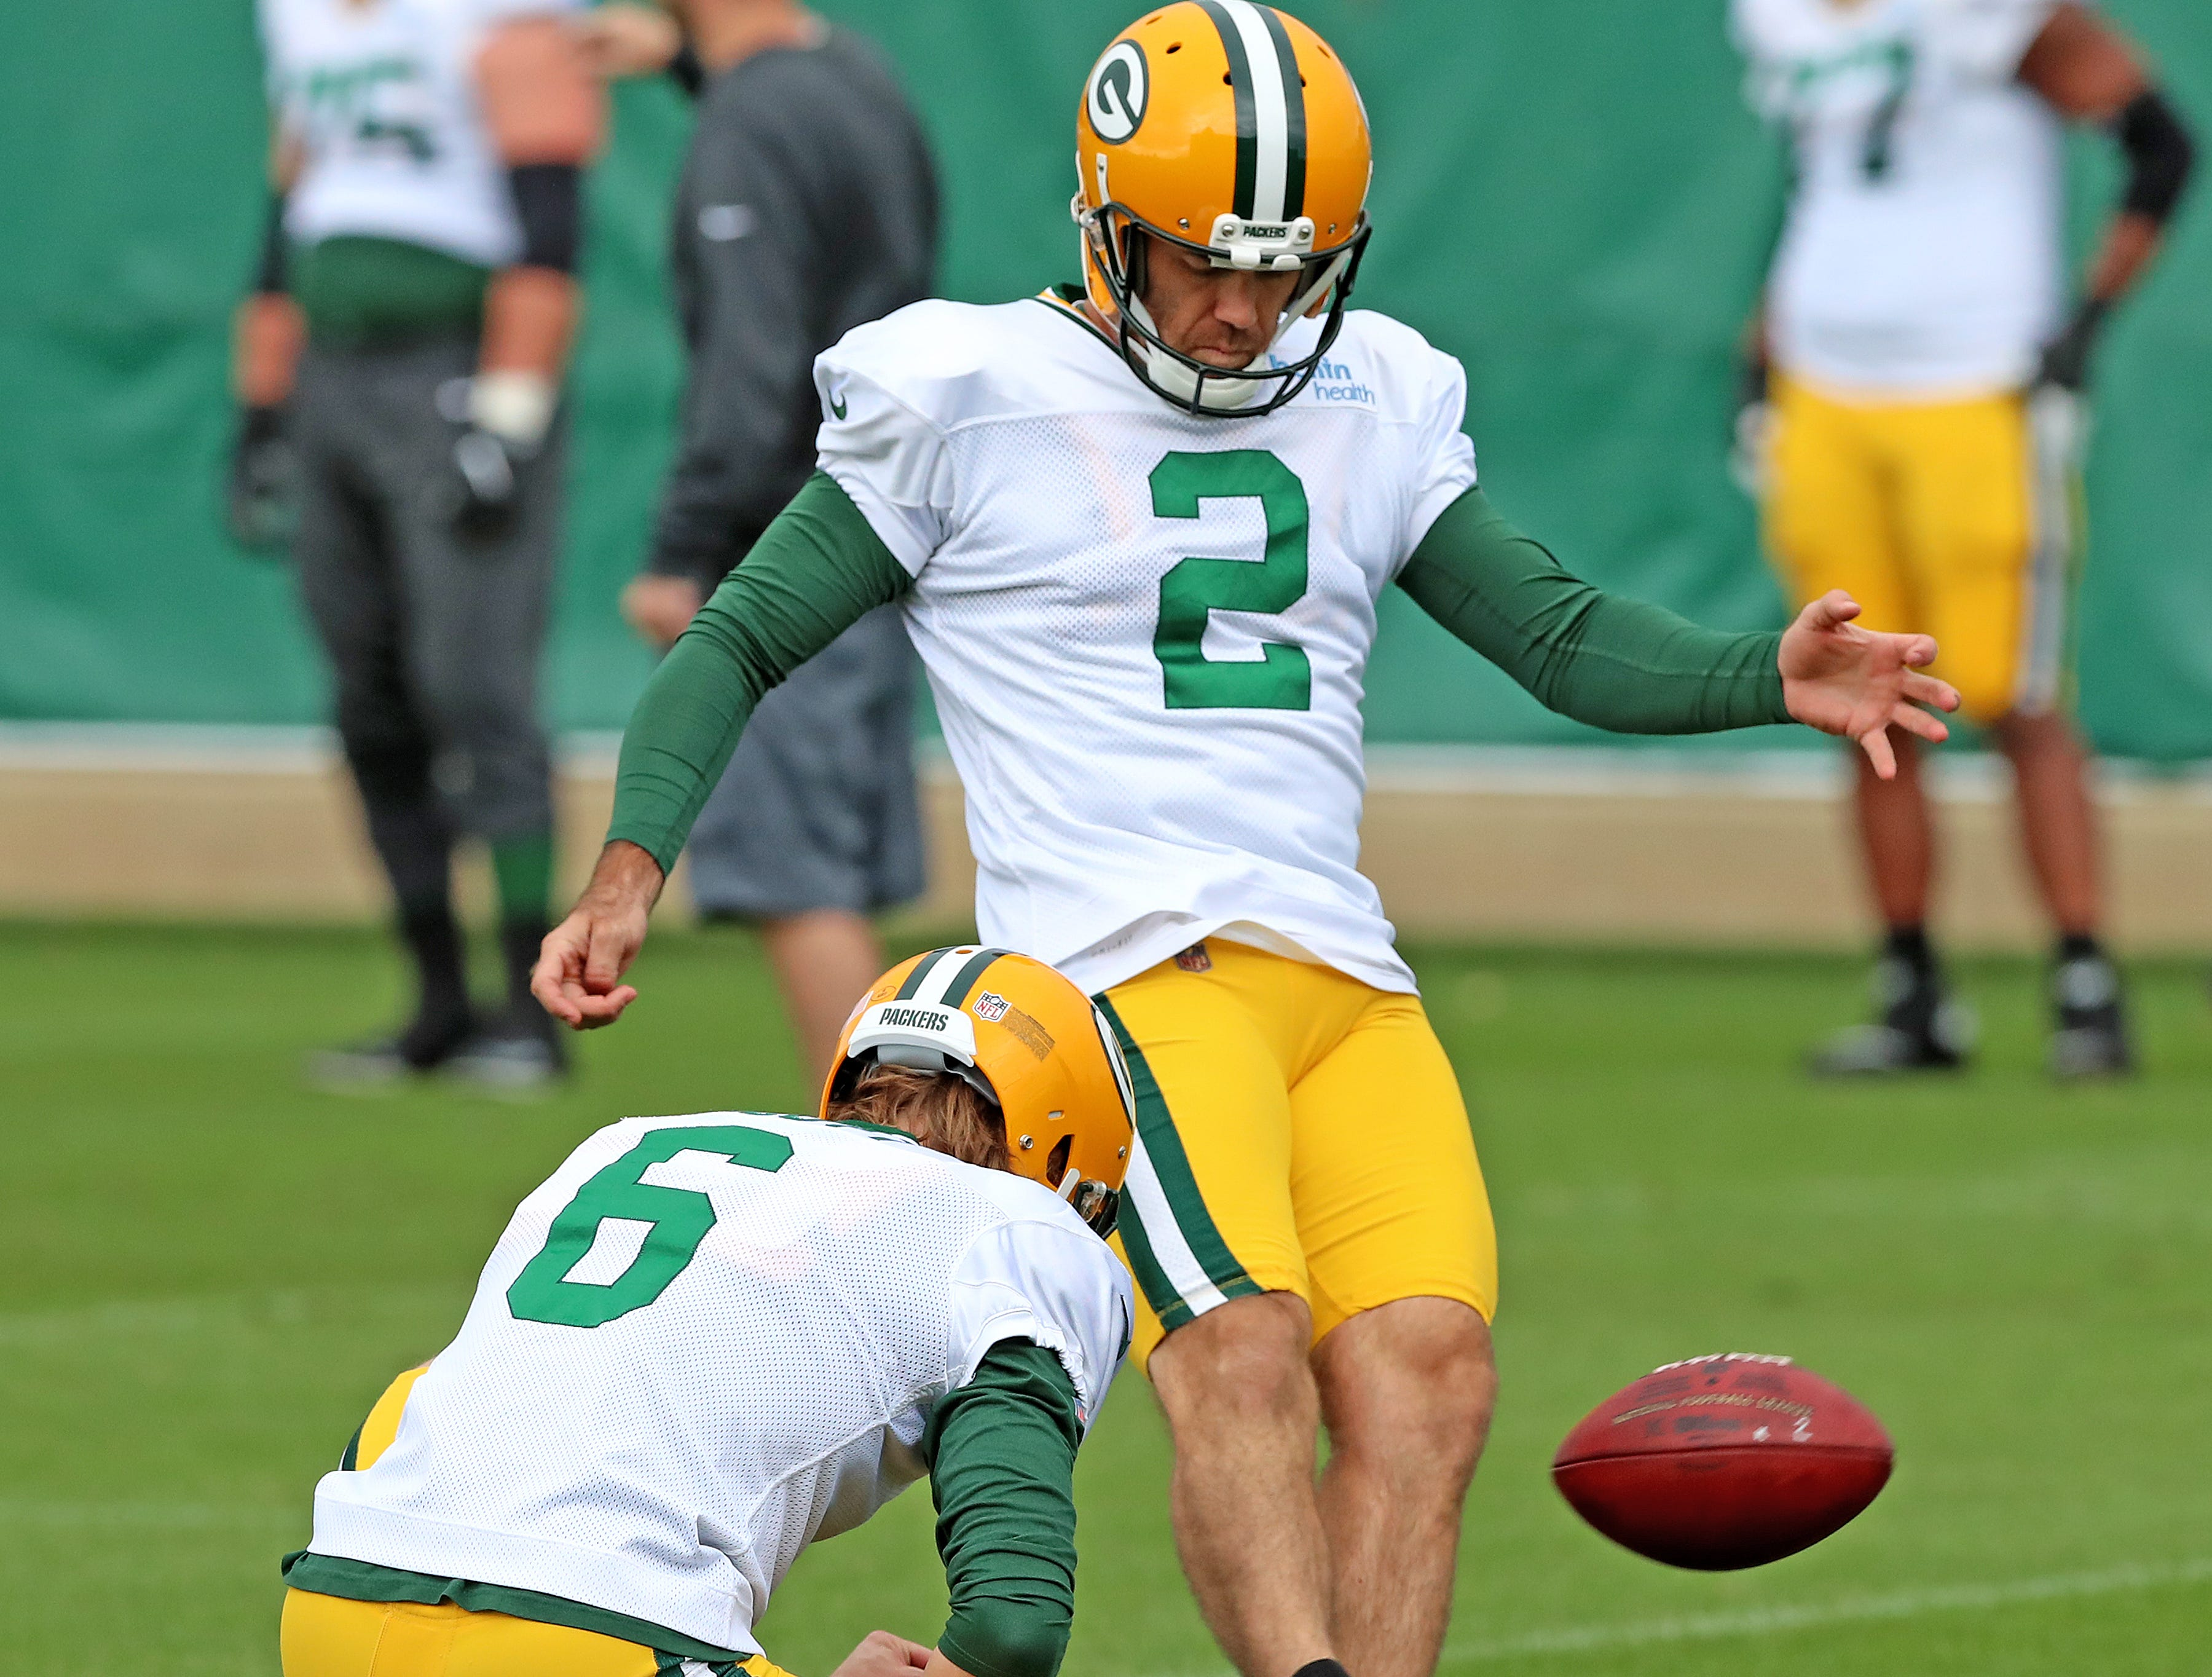 Green Bay Packers kicker Mason Crosby (2) kids from the hold of punter JK Scott (6) during practice on Clarke Hinkle Field Thursday, September 27, 2018 in Ashwaubenon, Wis